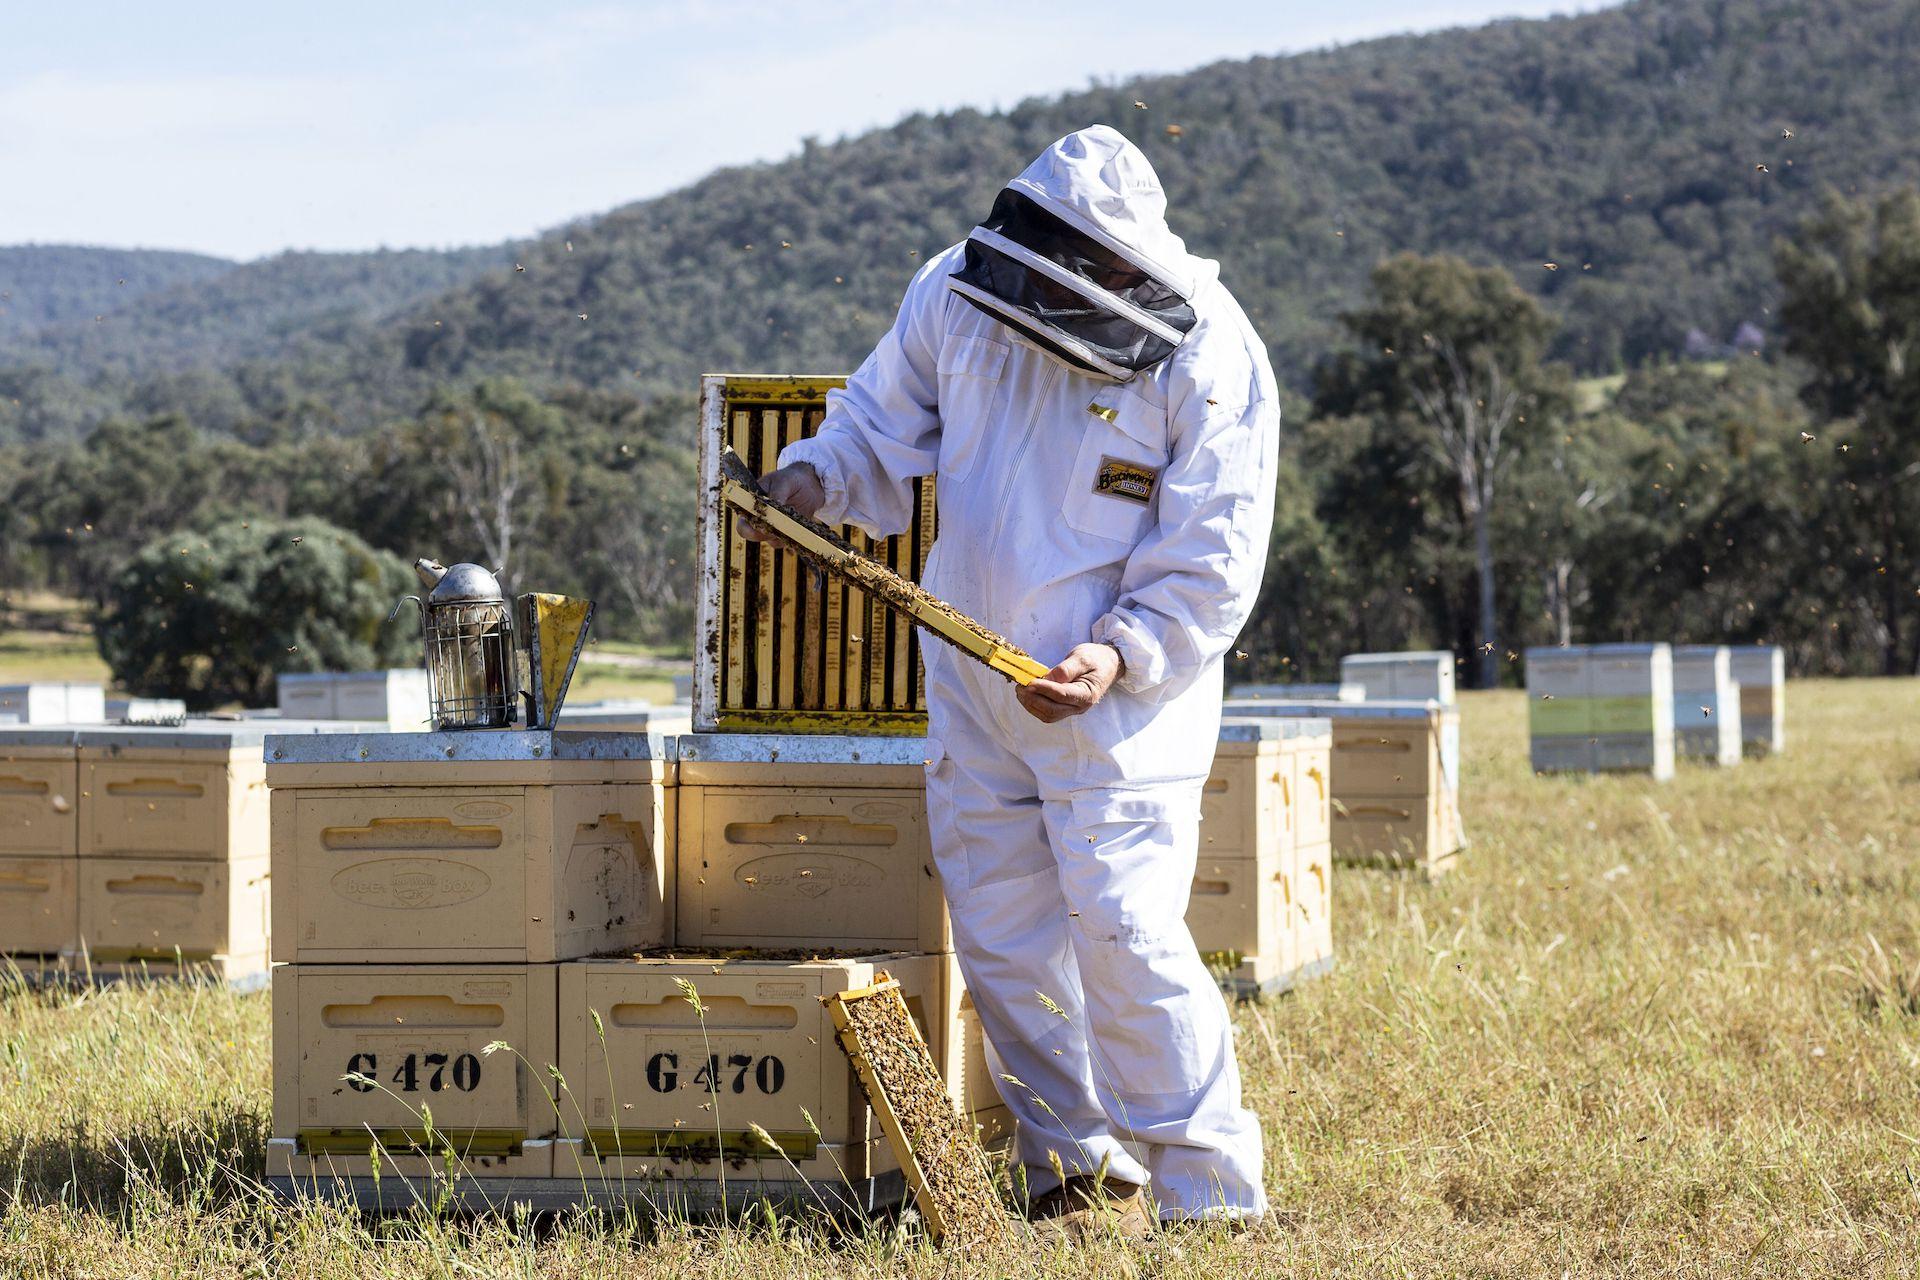 https://the-citizen-web-assets-us.s3.amazonaws.com/uploads/2020/05/12133602/Hives2.jpeg